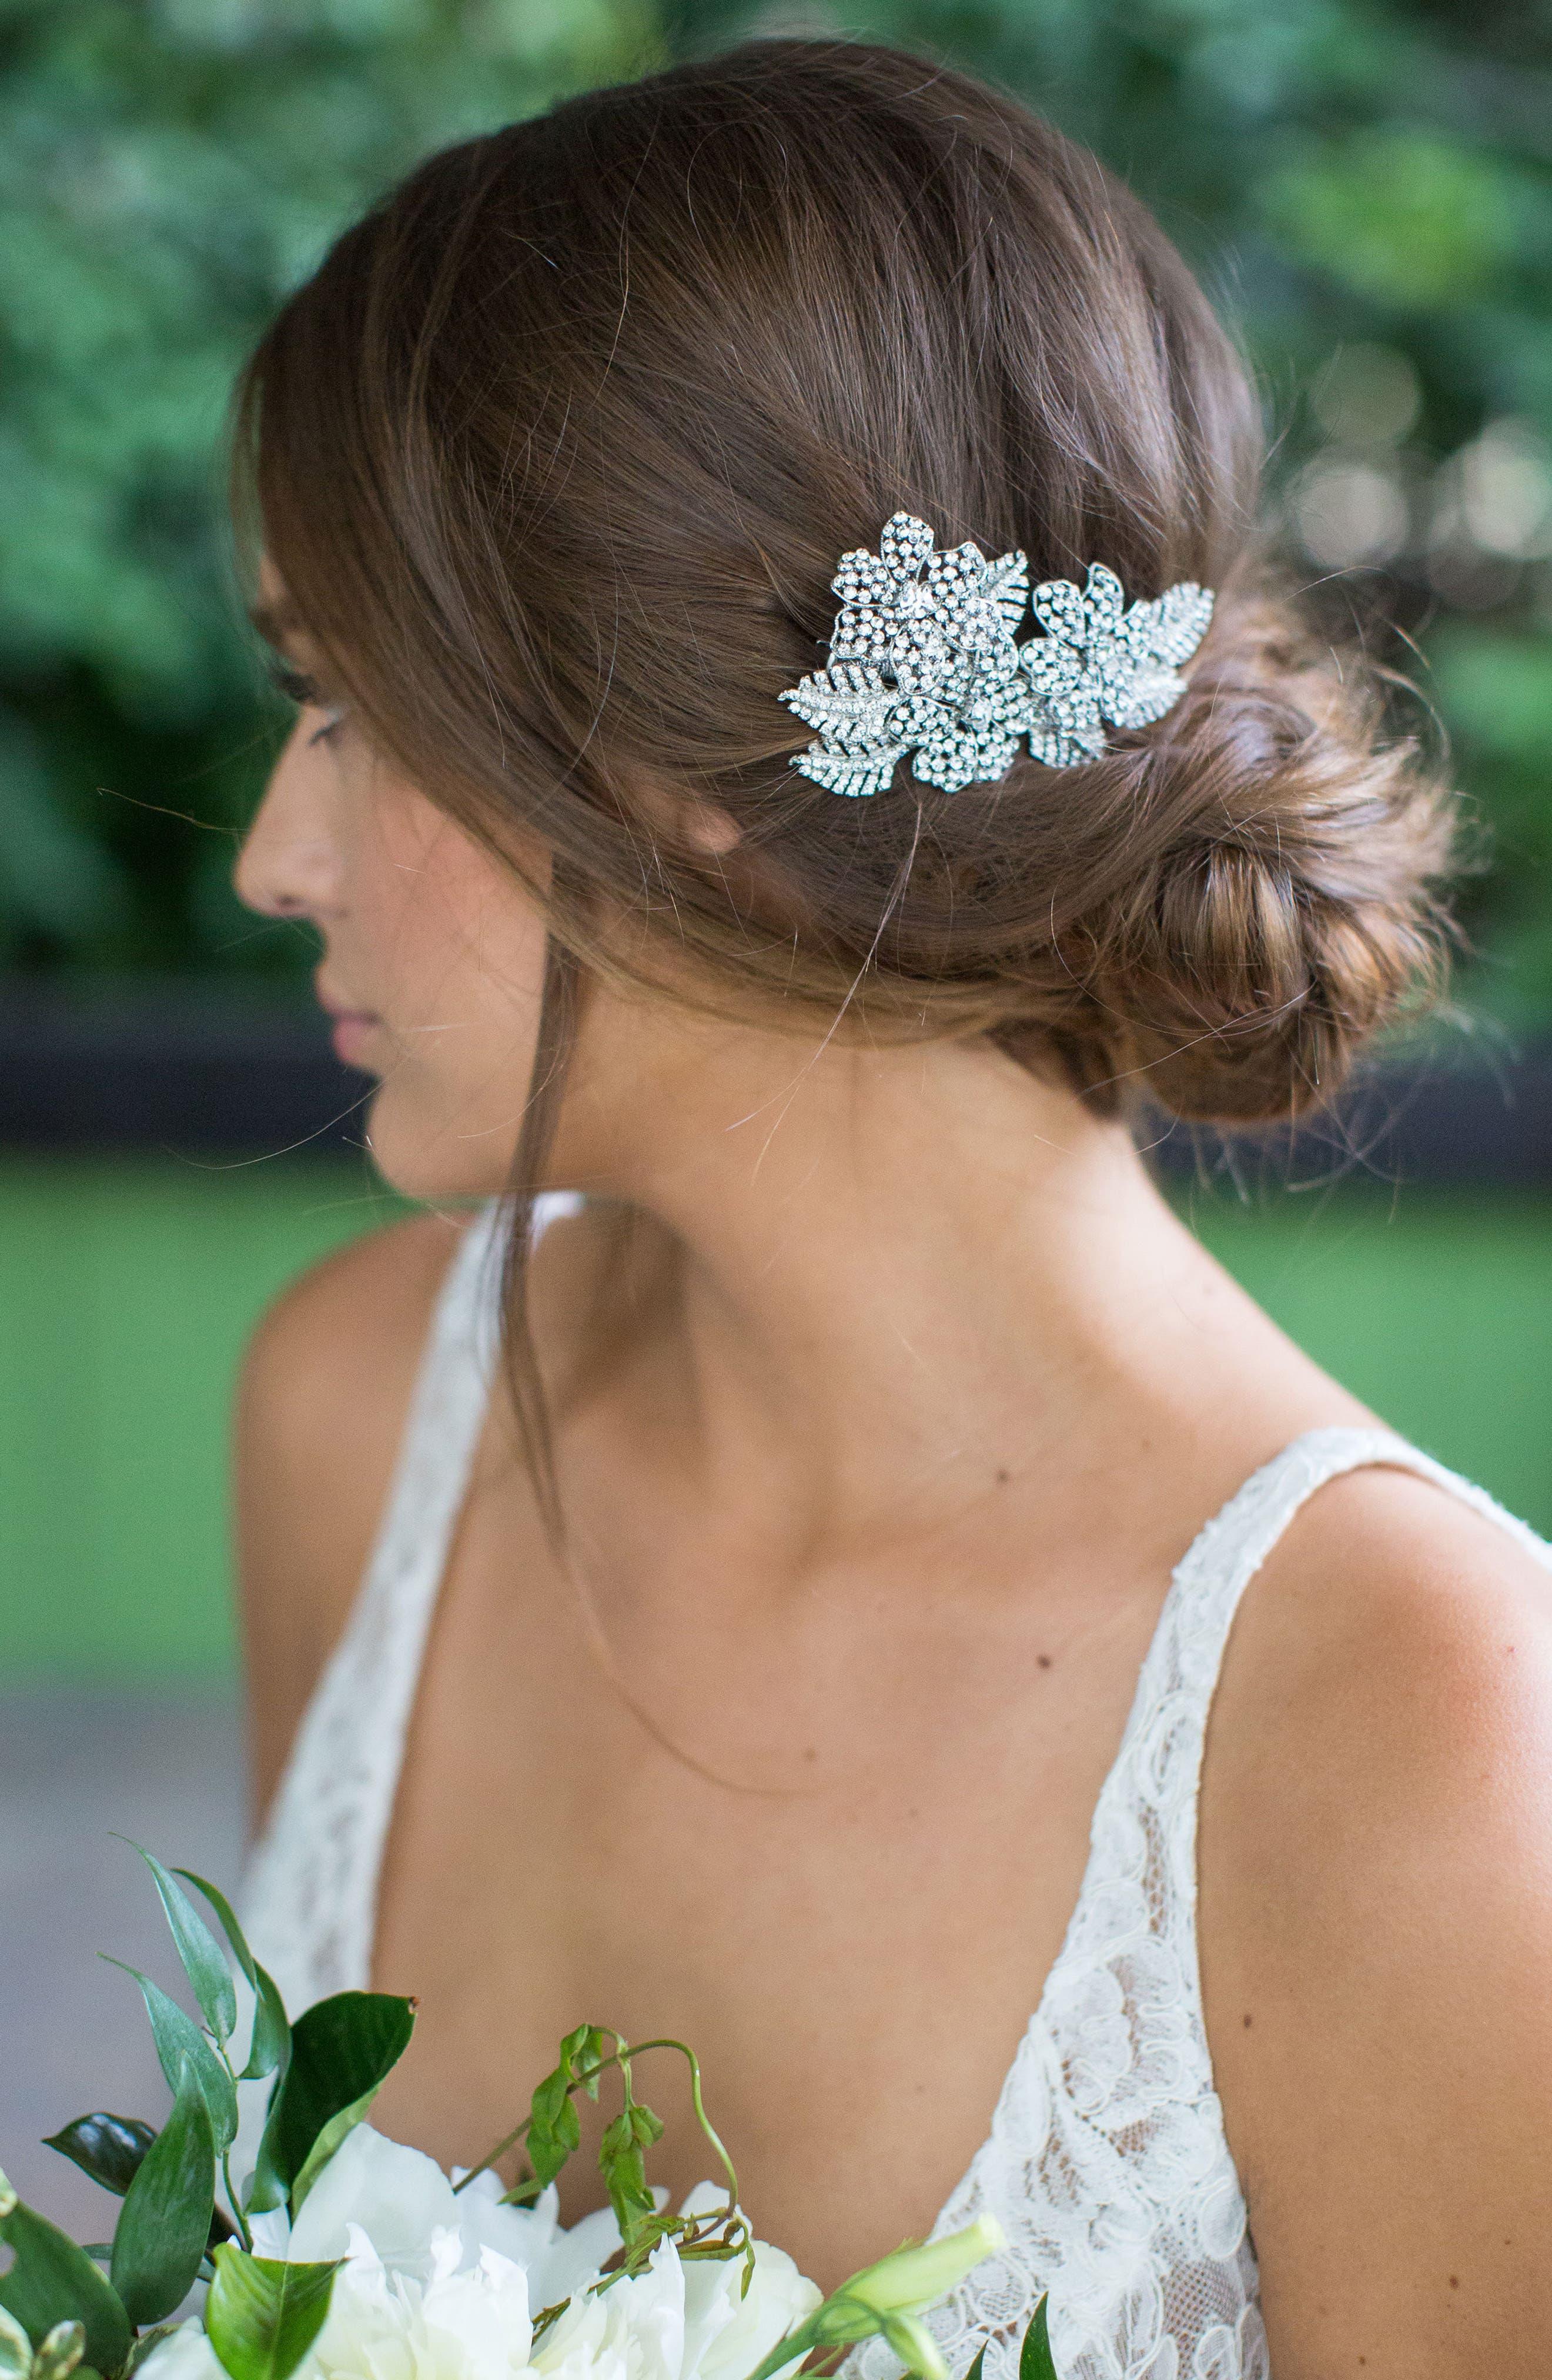 Alternate Image 1 Selected - Brides & Hairpins 'Esther' Crystal Embellished Hair Clip